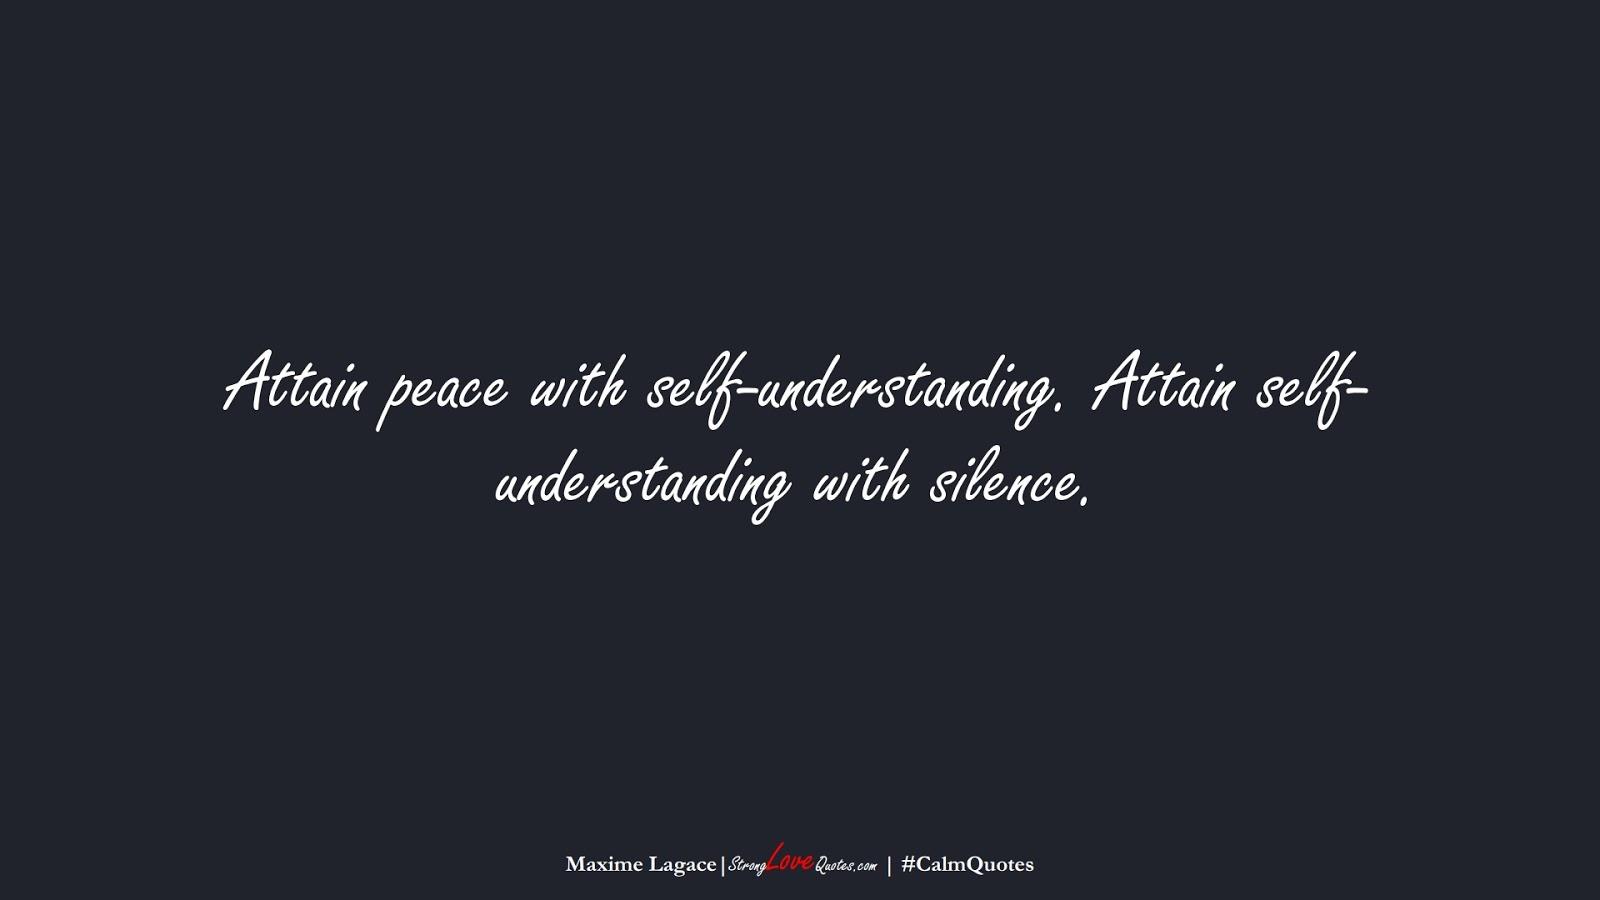 Attain peace with self-understanding. Attain self-understanding with silence. (Maxime Lagace);  #CalmQuotes